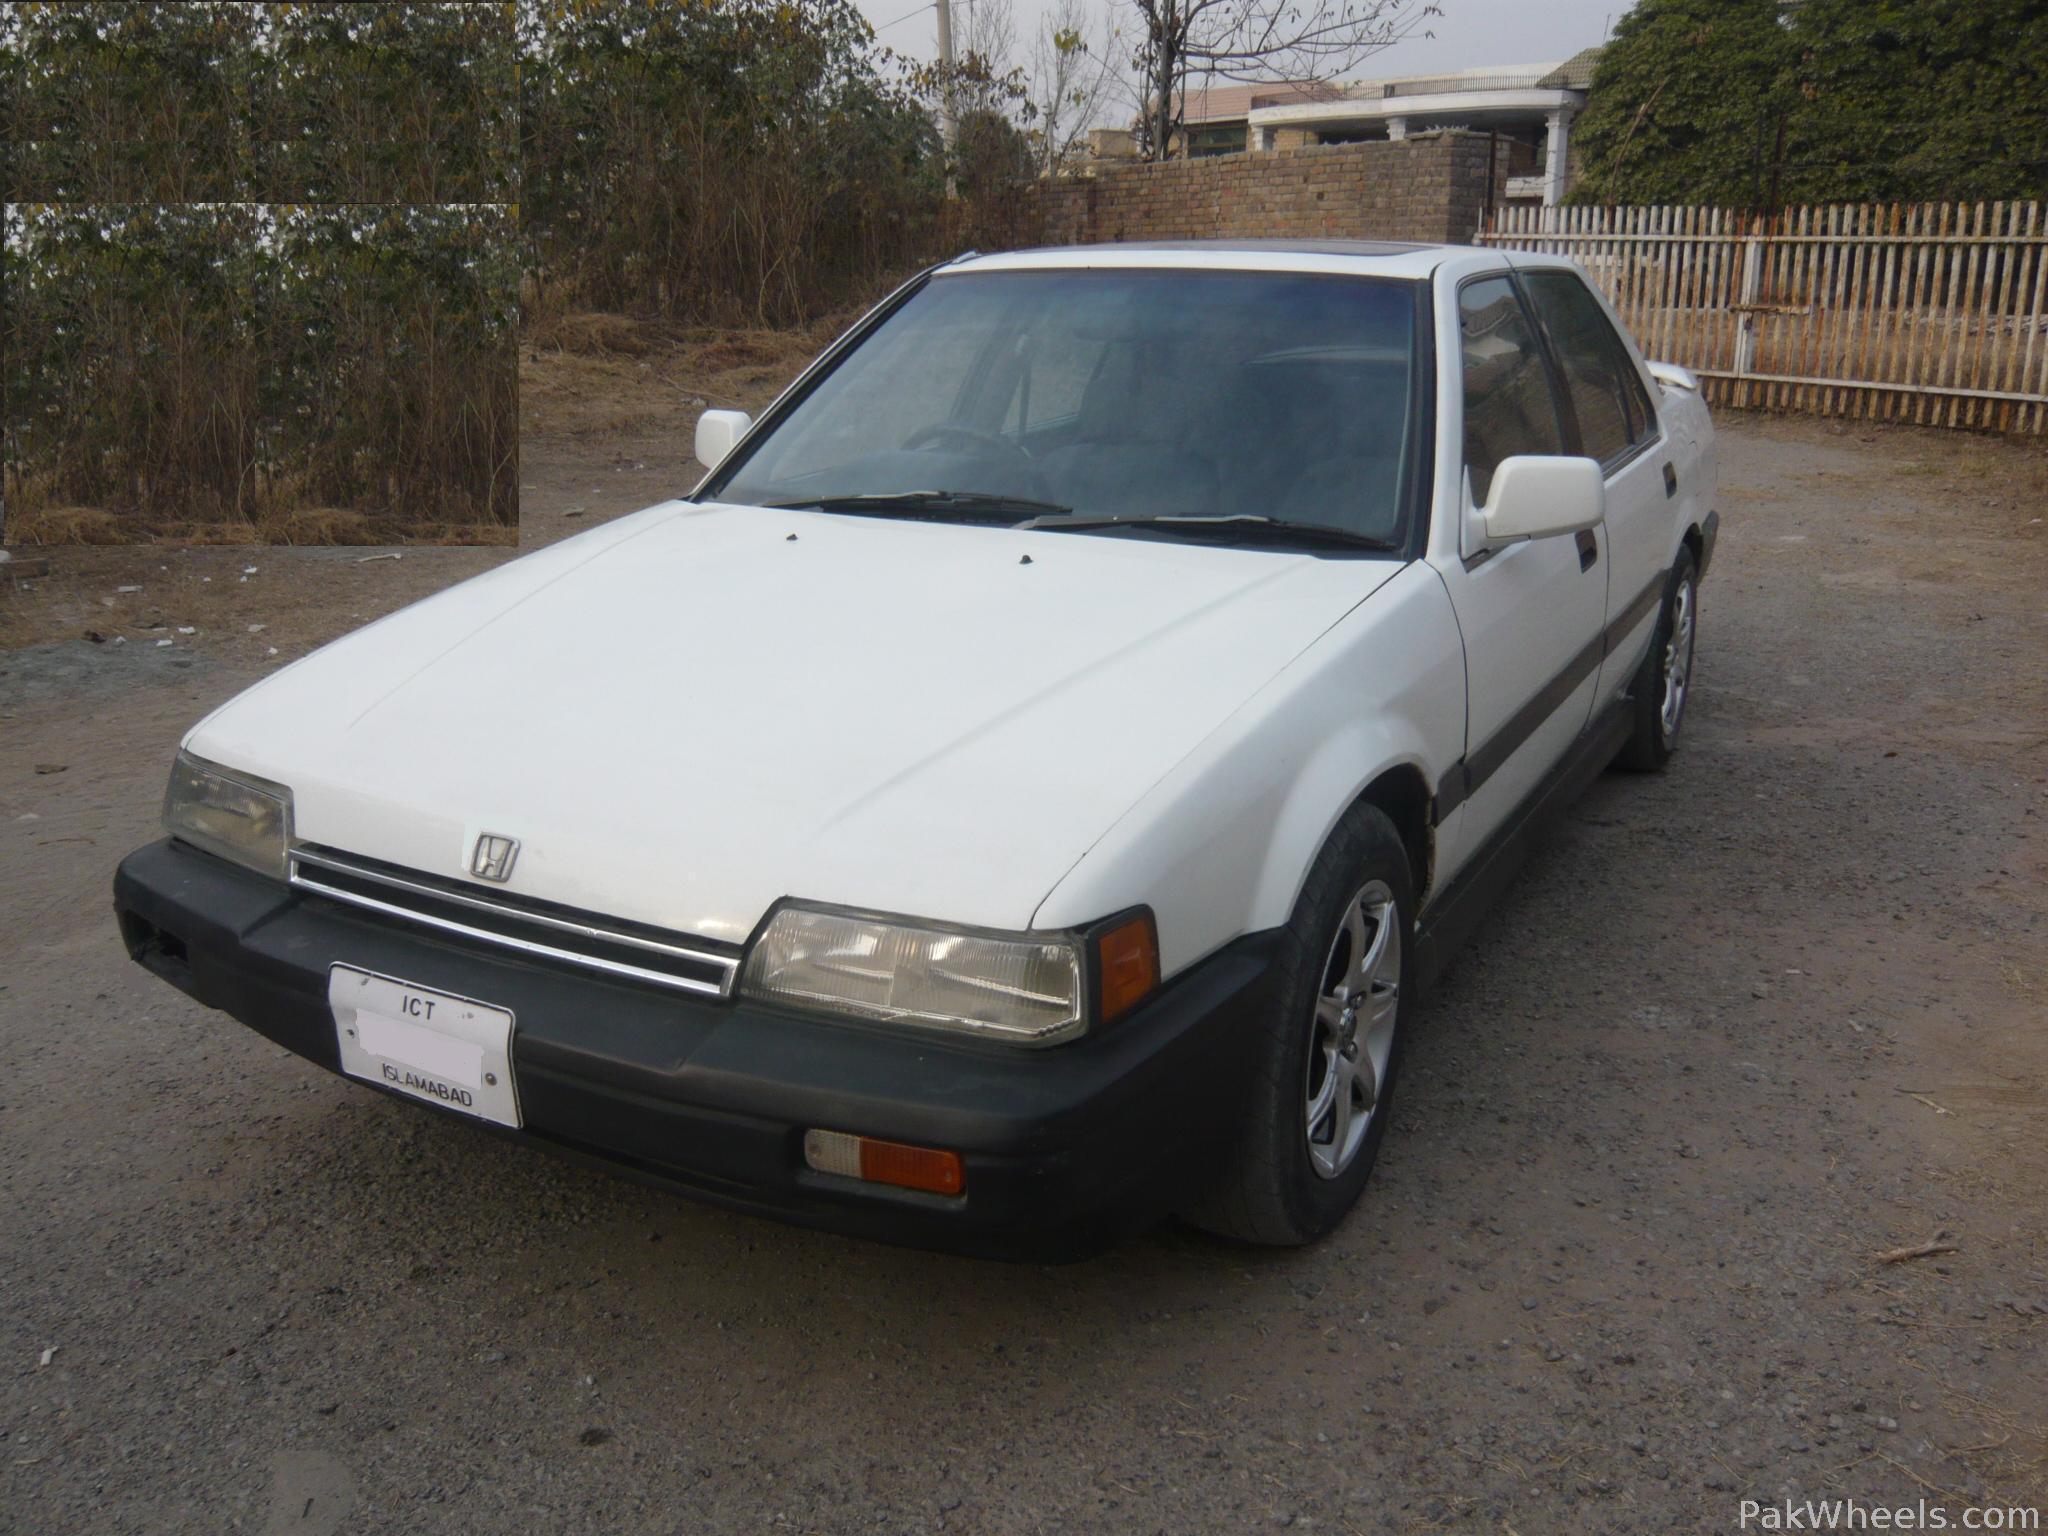 Honda Accord 1987 of Pkwheel - Member Ride 12093 | PakWheels